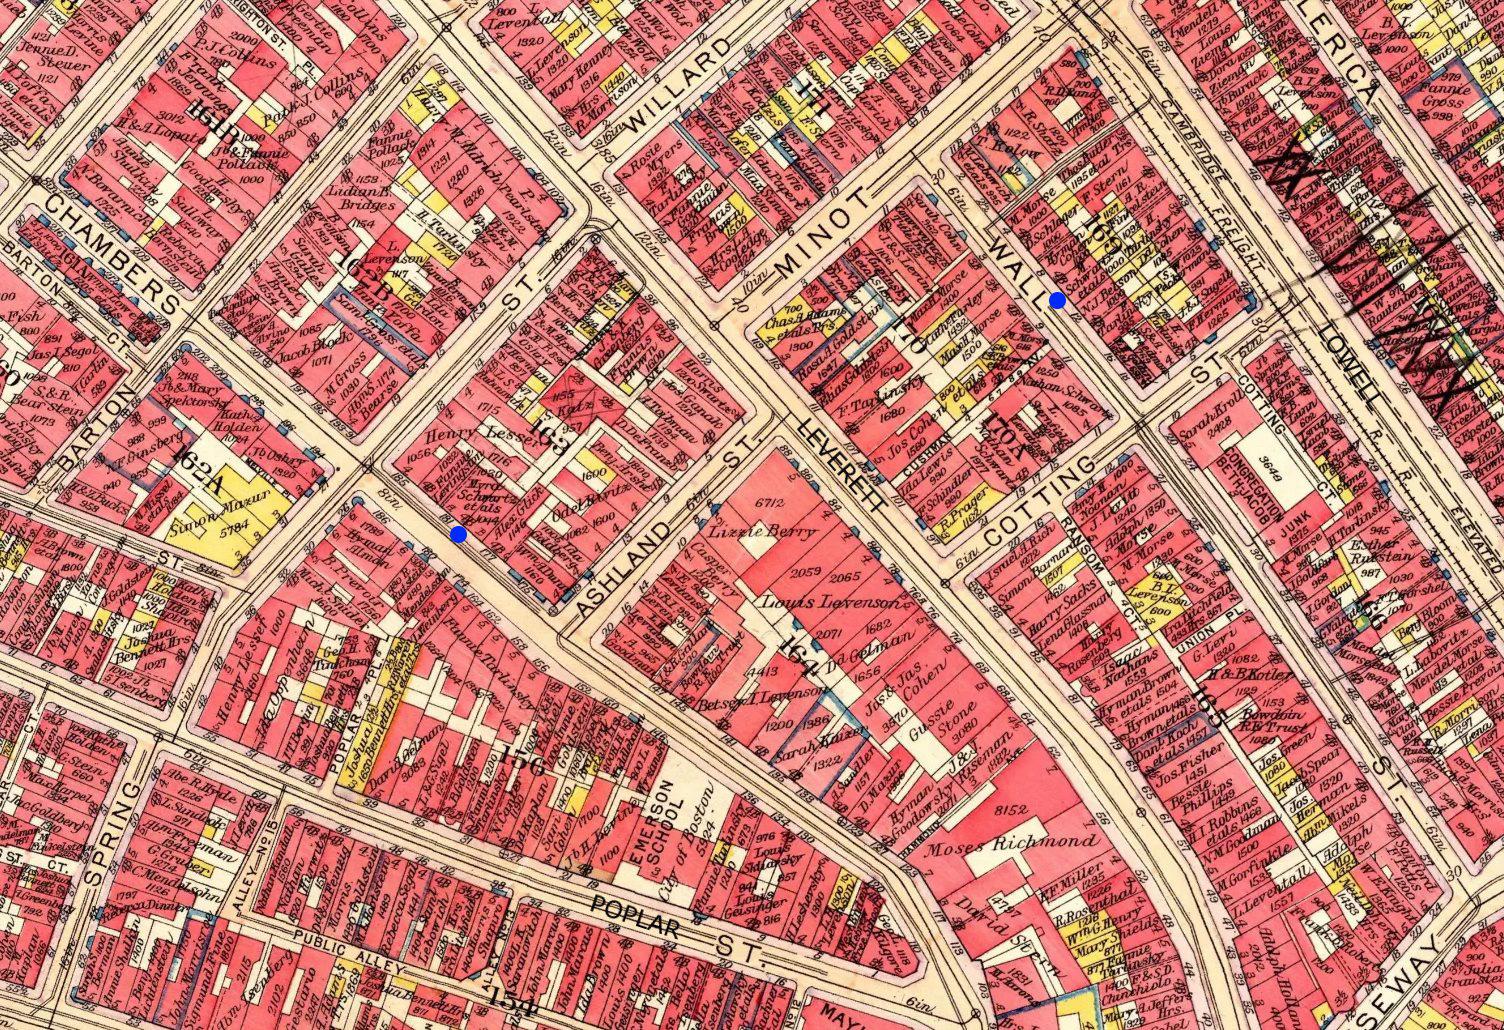 Schwartz Residences on 1917 Boston Bromley Atlas